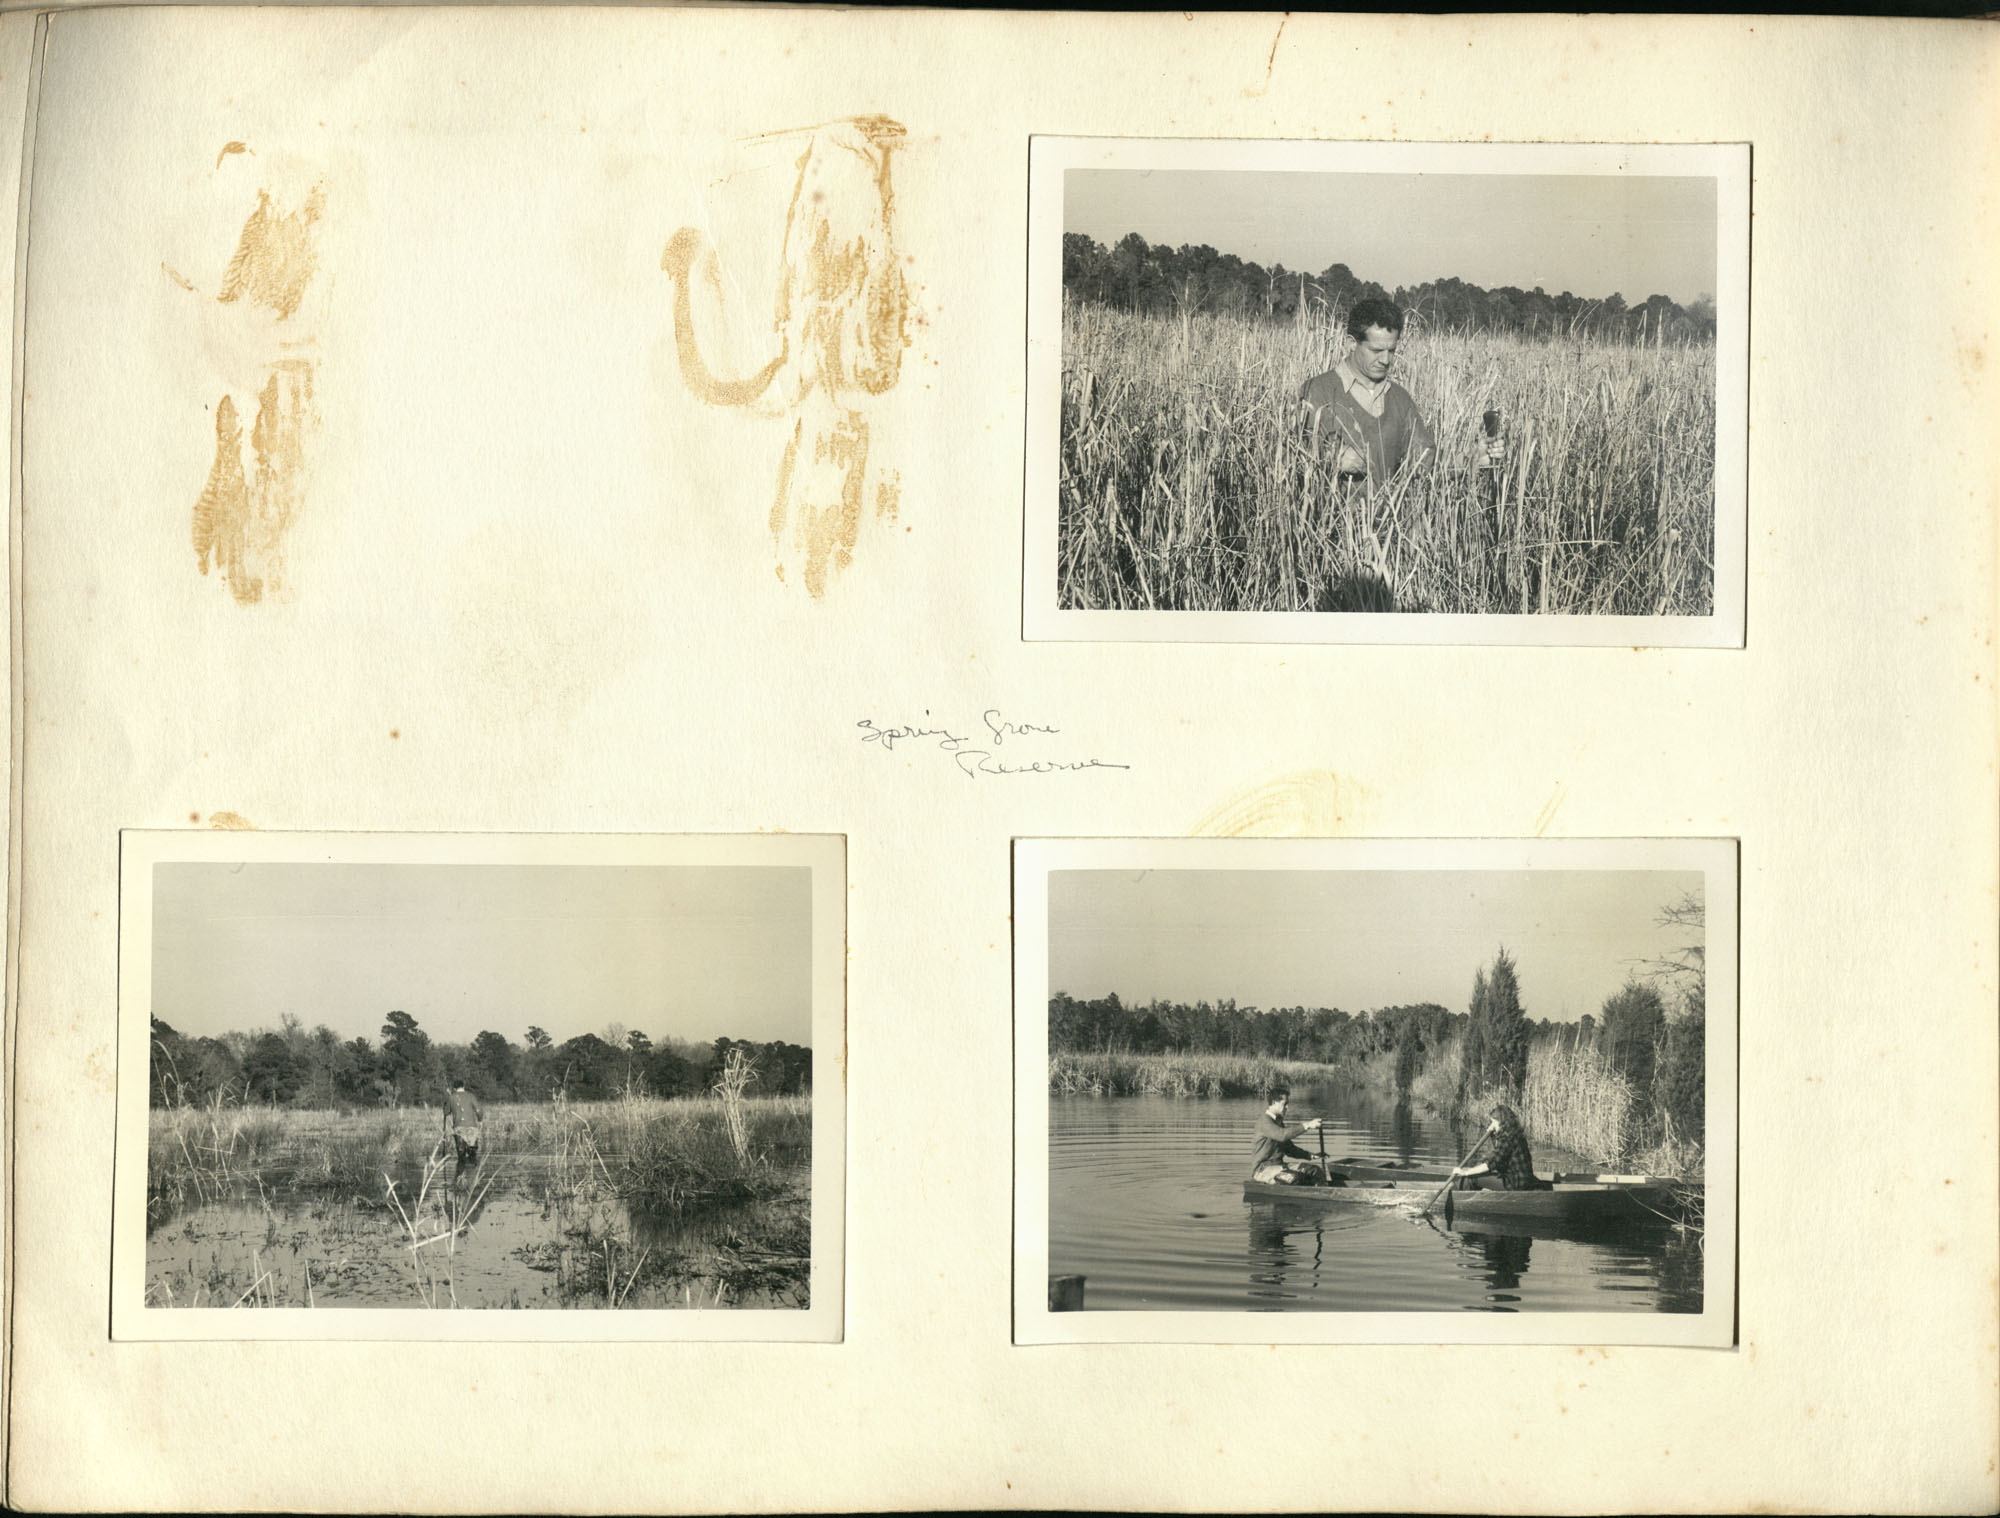 Medway Plantation Photograph Album, 1949, page 116